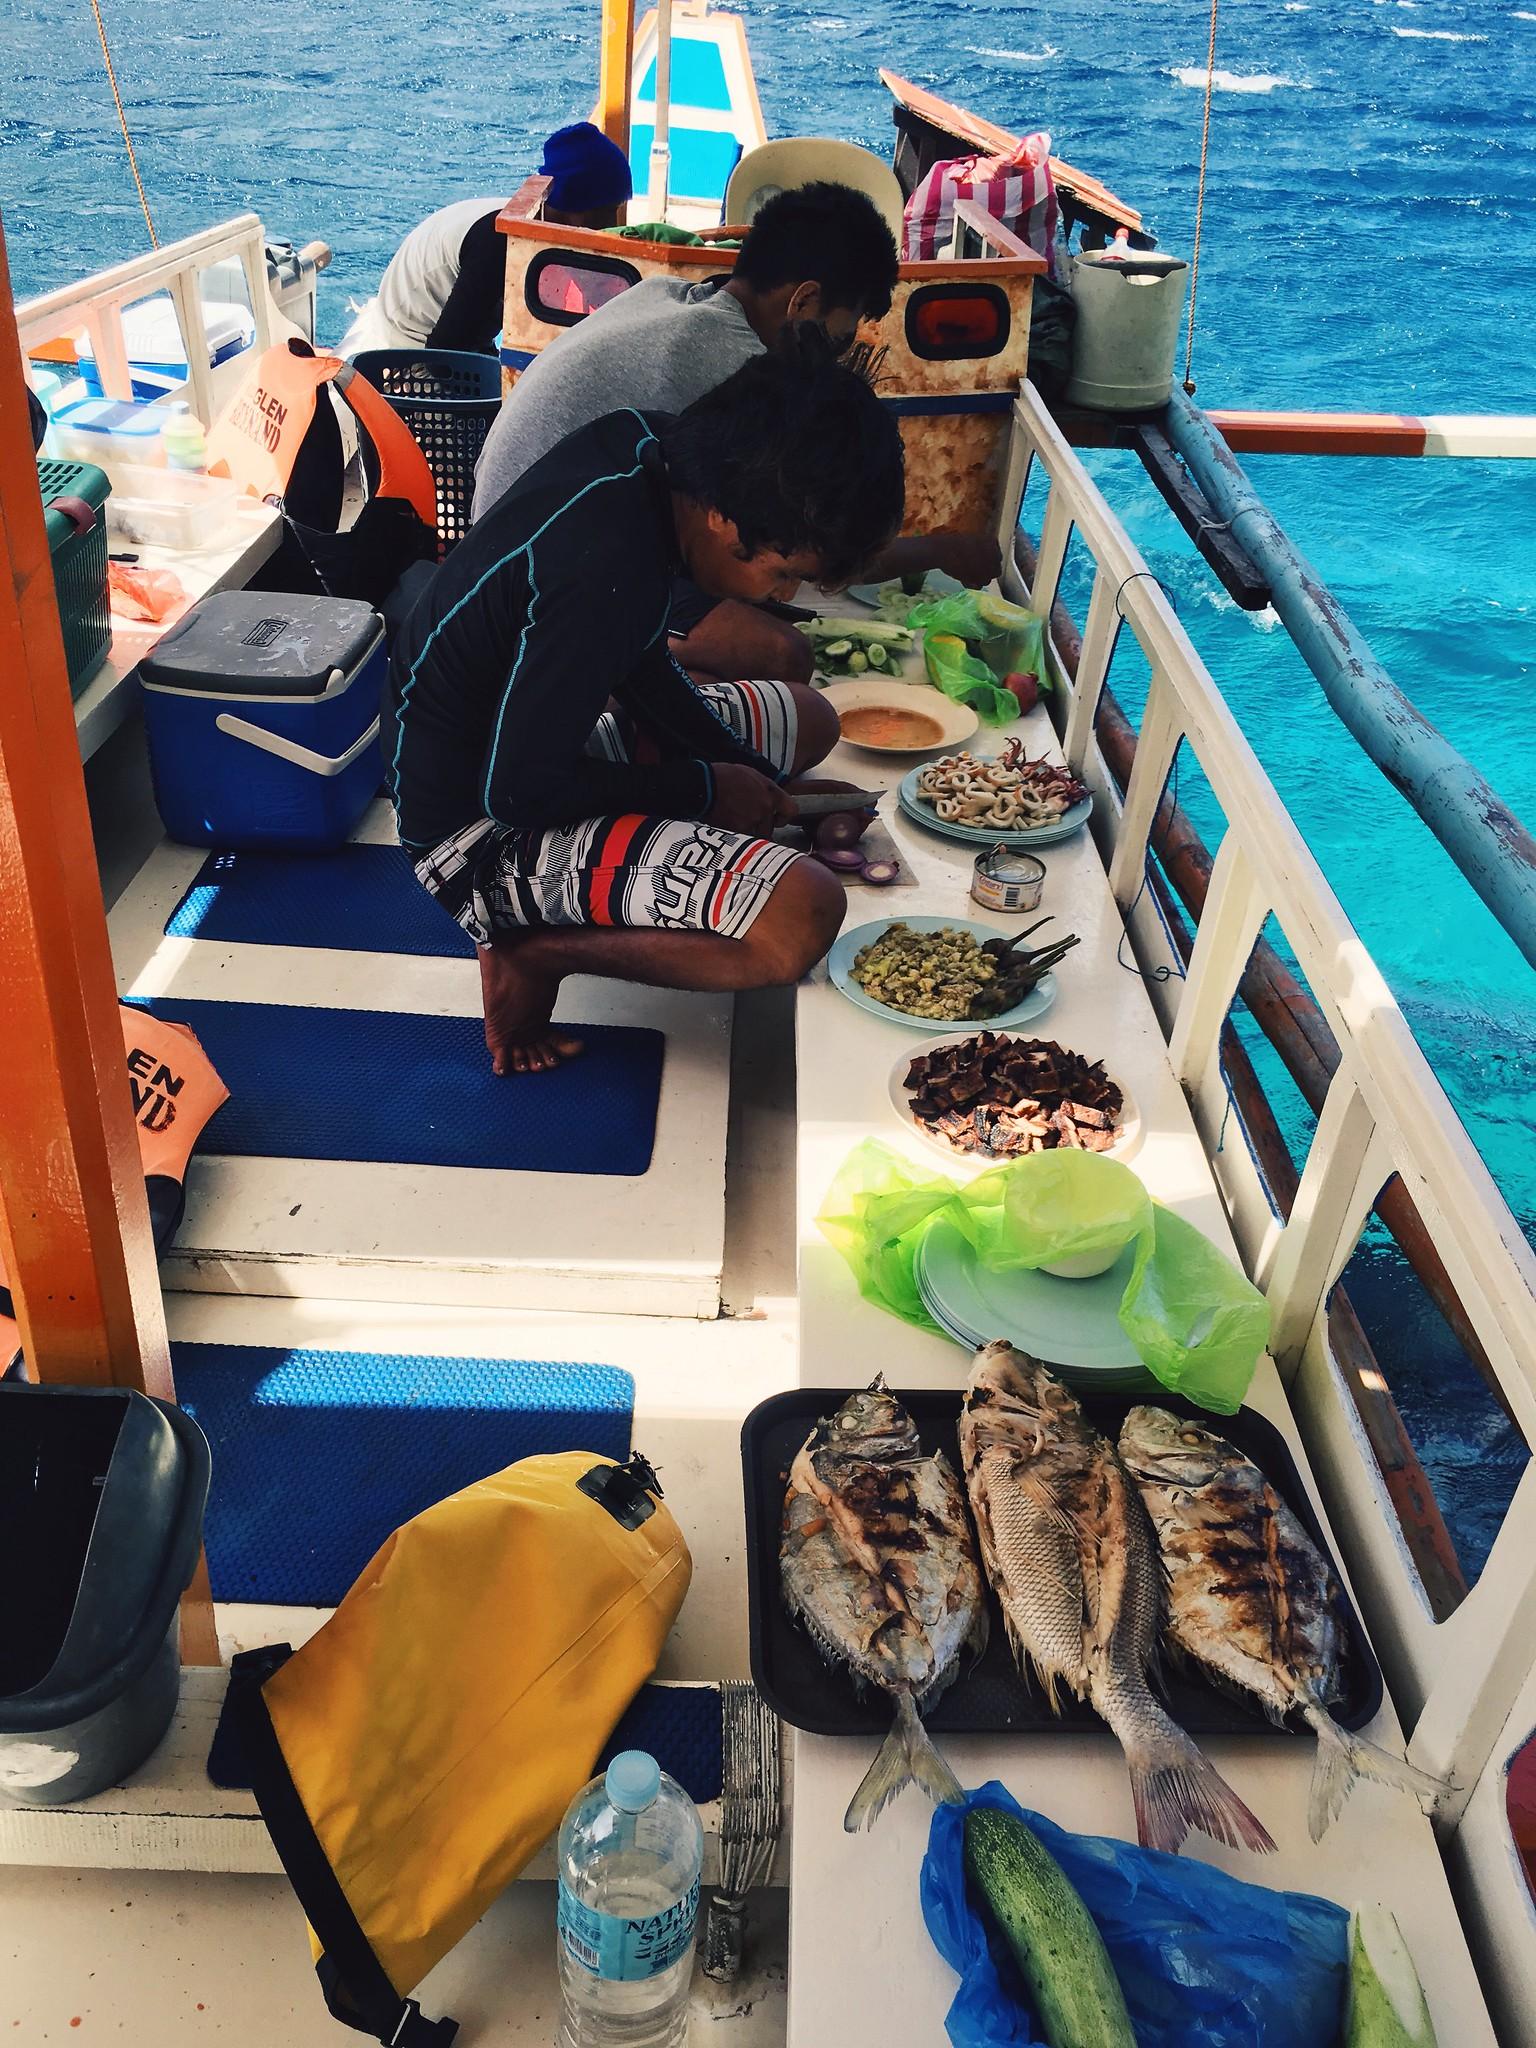 The crew preparing lunch.